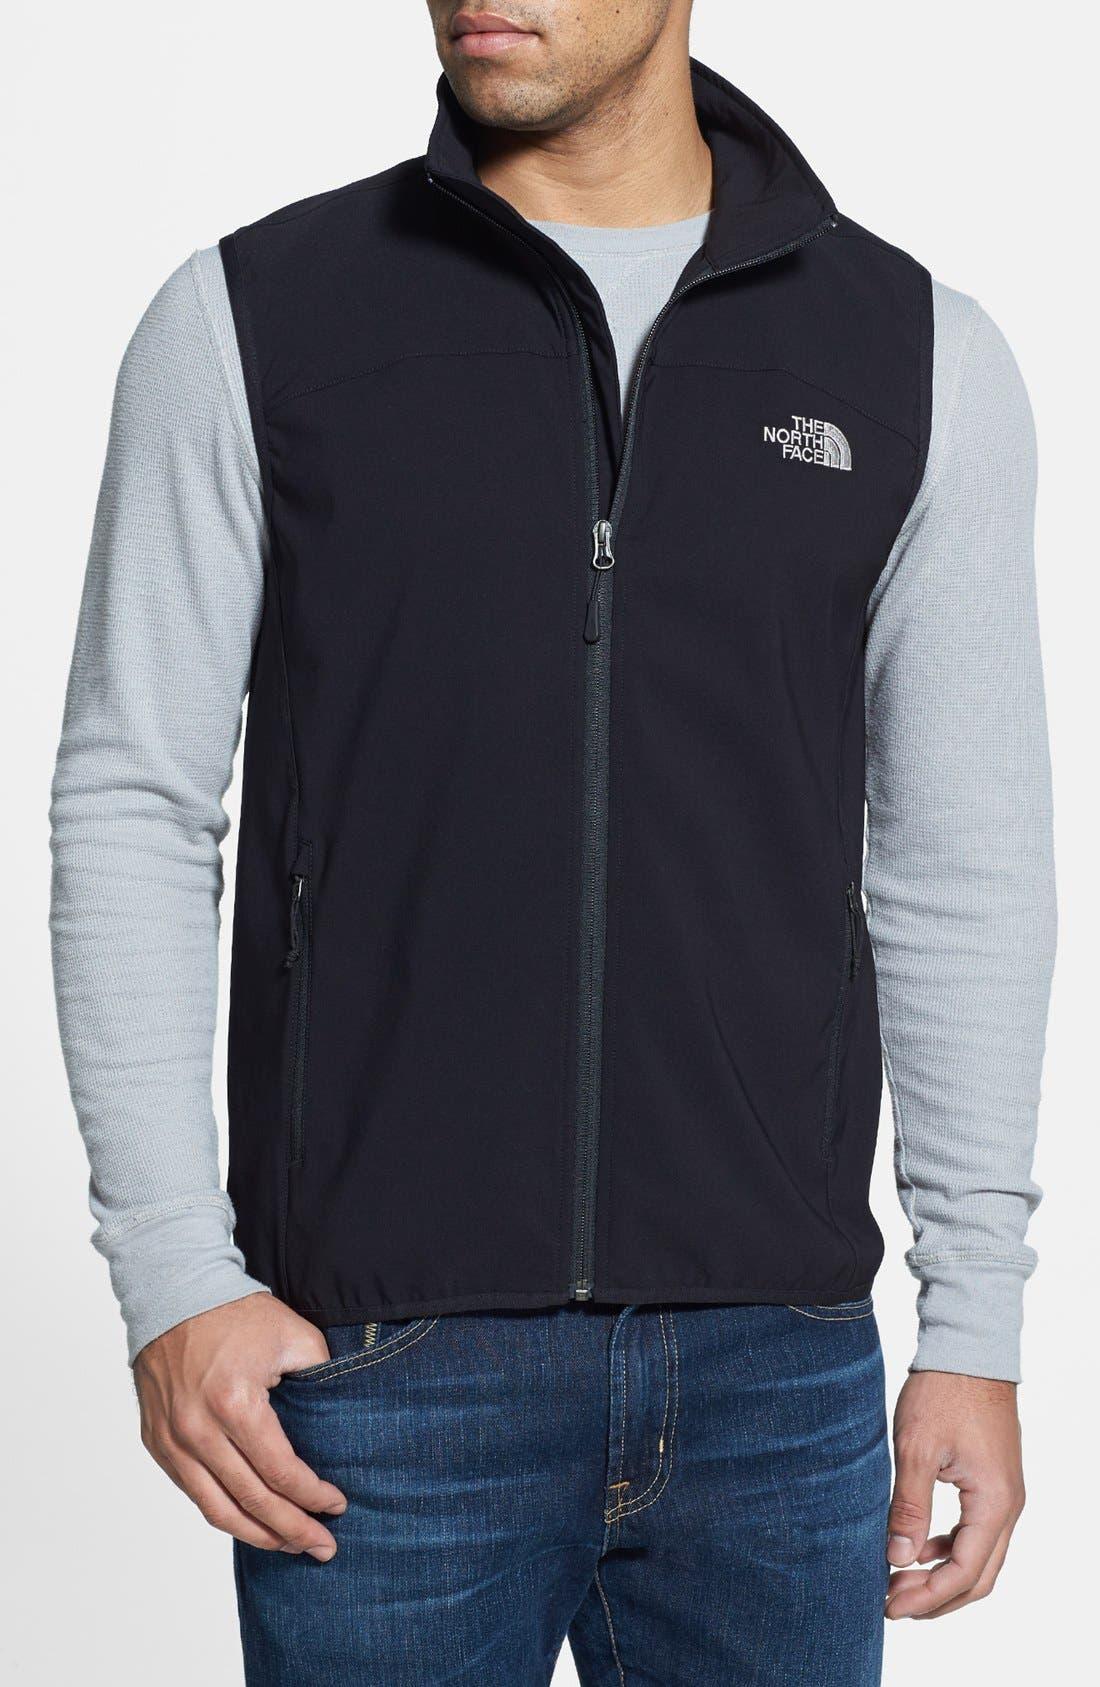 Main Image - The North Face 'Nimble' Wind Resistant Vest